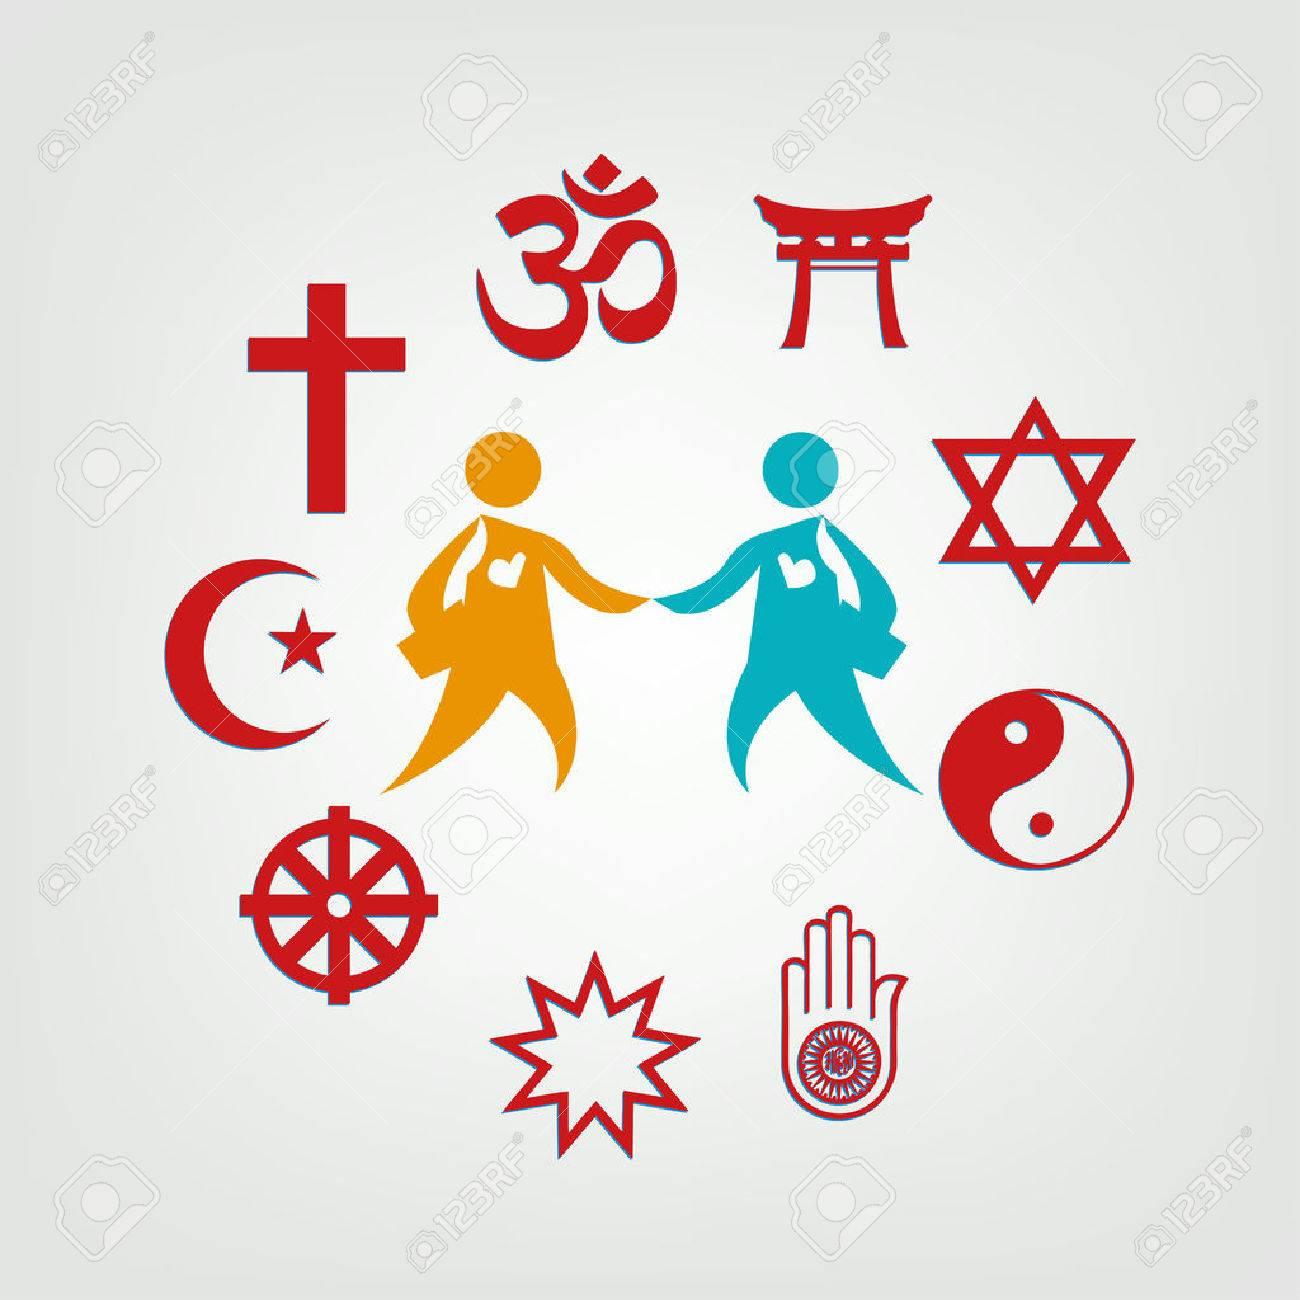 Interfaith Dialogue illustration. Editable Clip Art. Religious symbols  surrounding two persons. Stock Vector